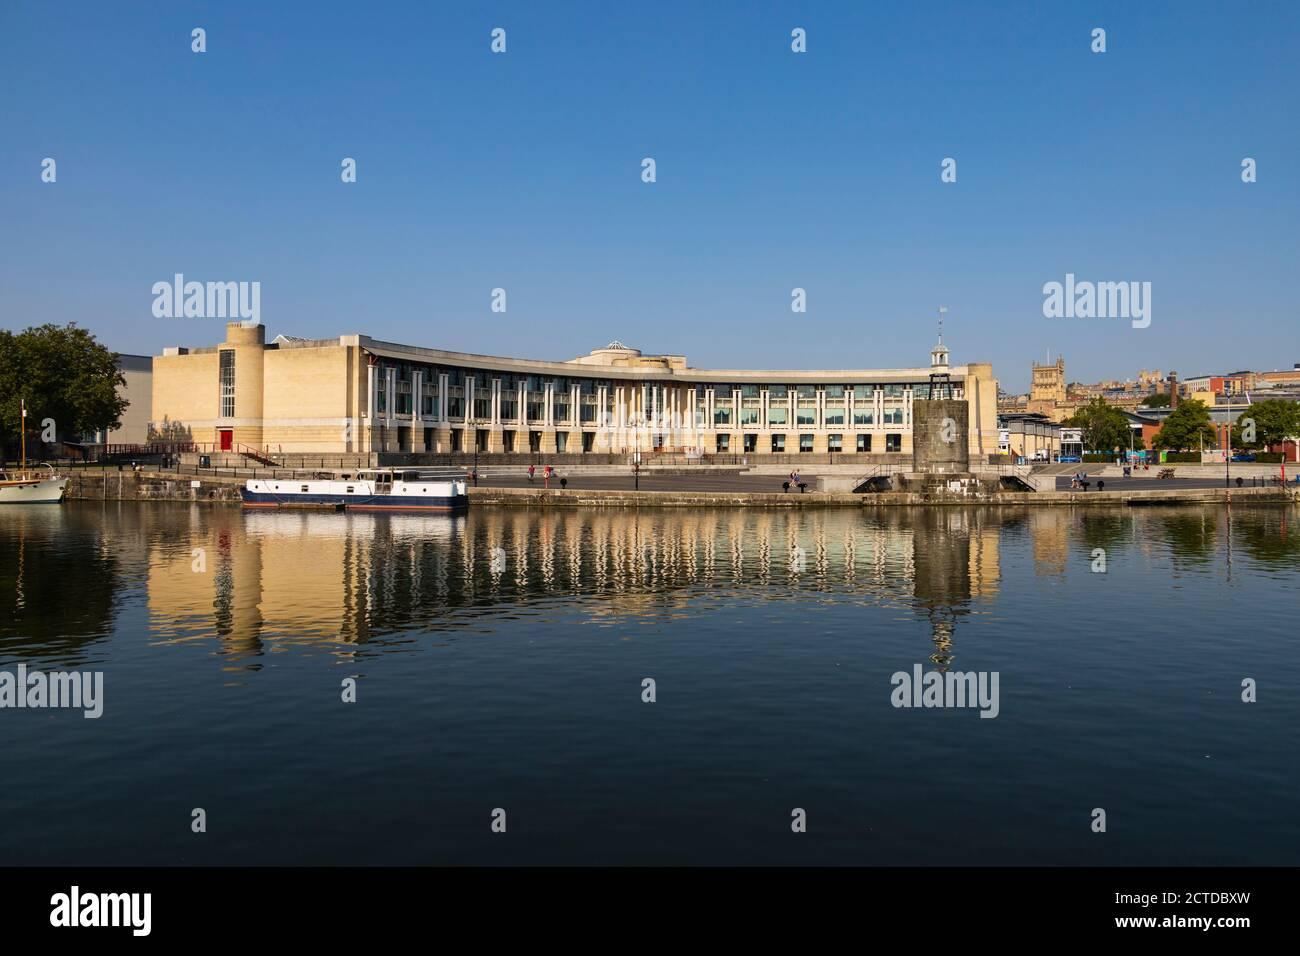 Lloyds bank amphitheatre, Bristol, England. Sept 2020 Stock Photo